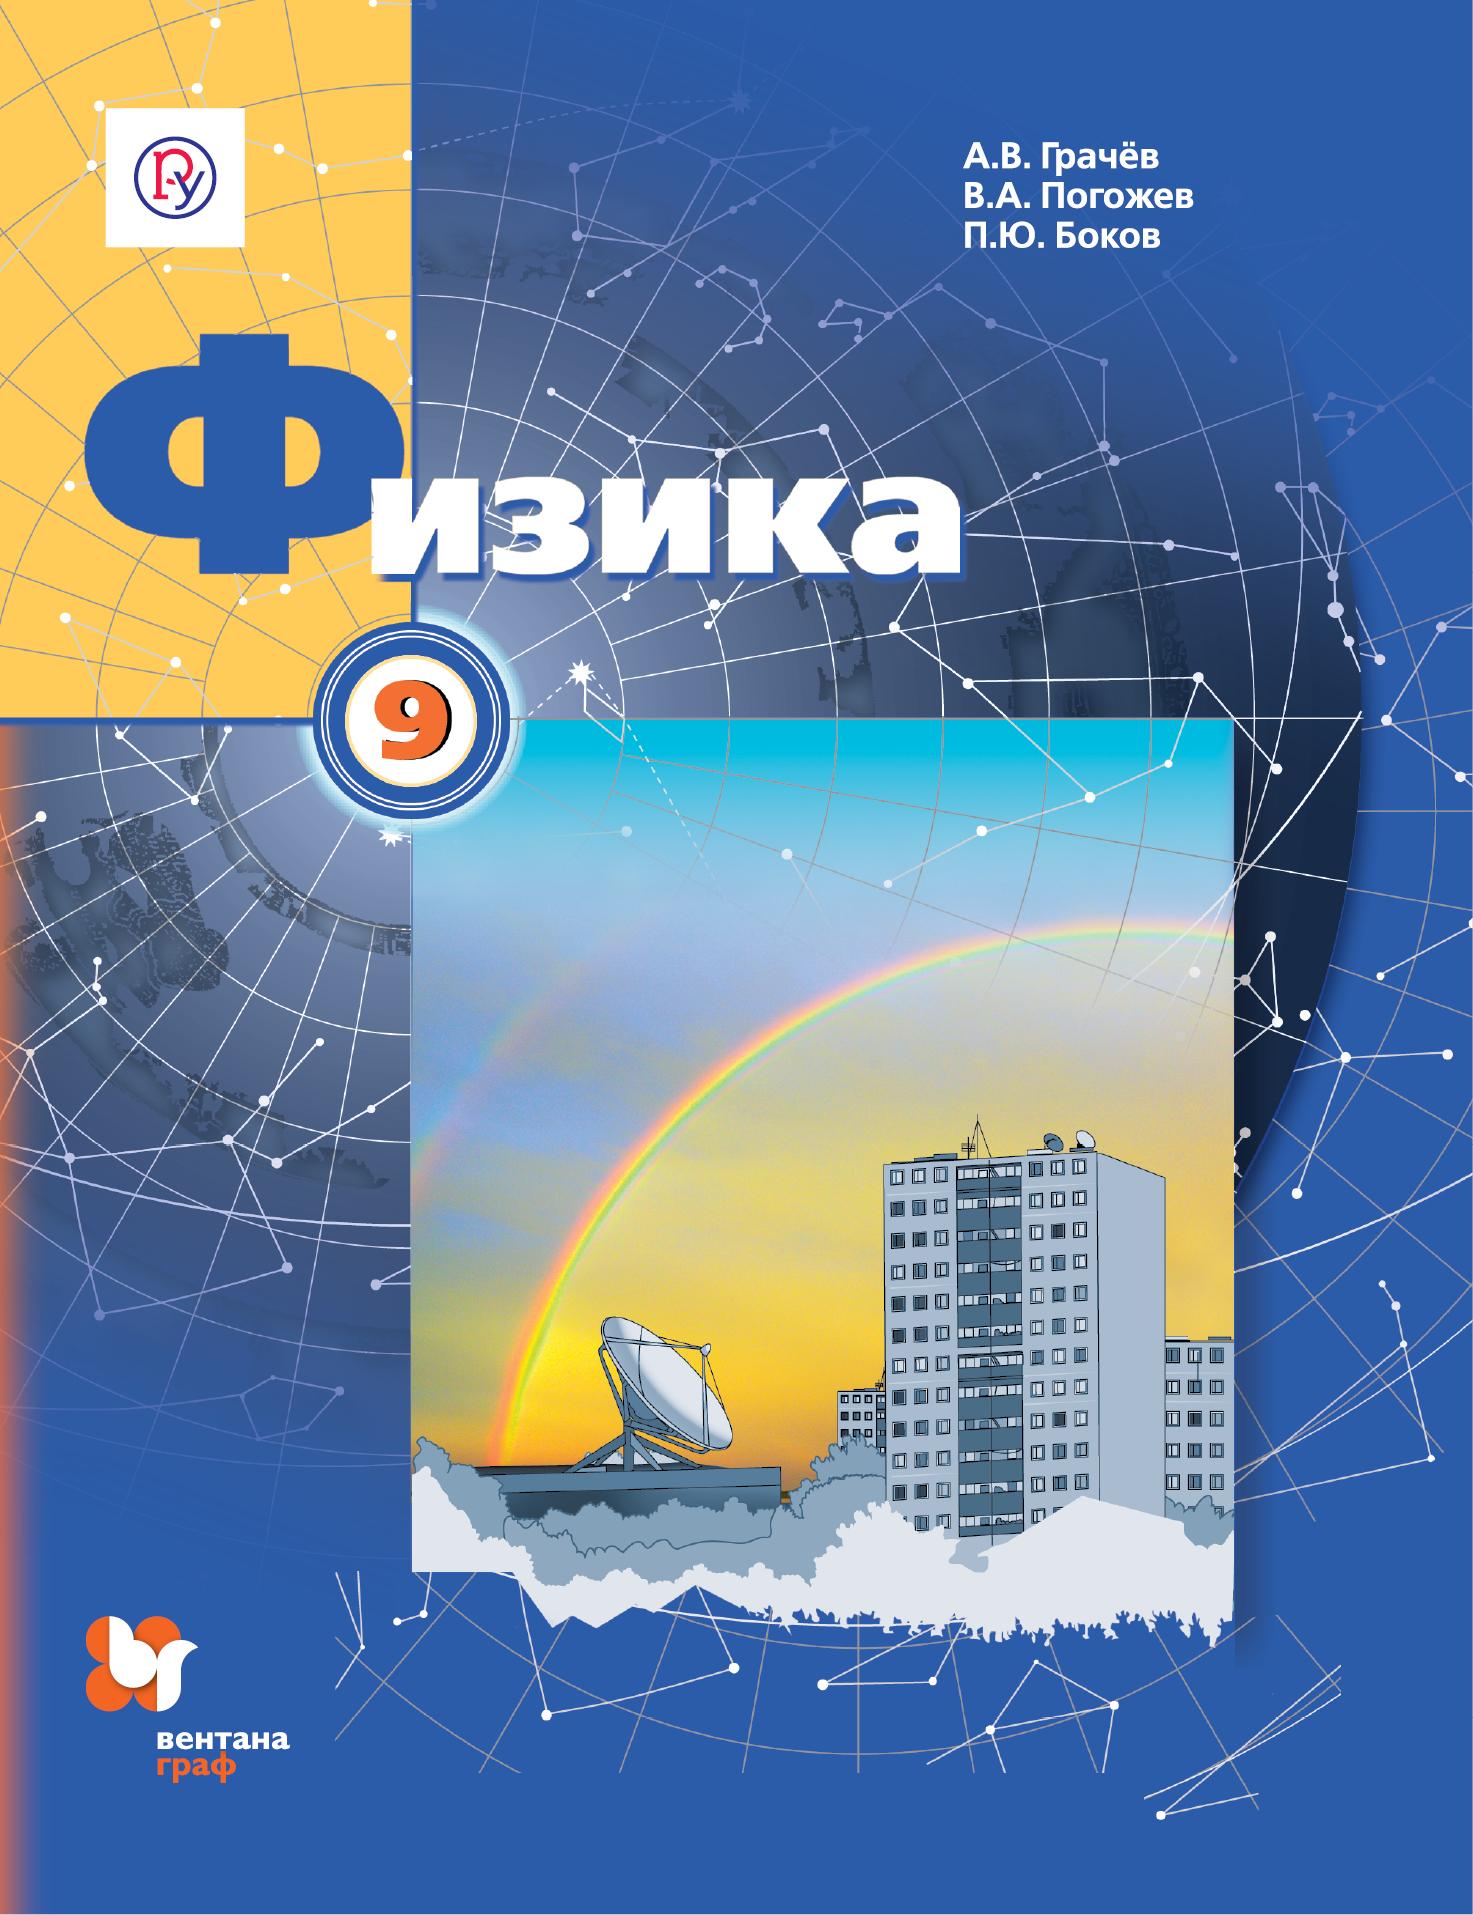 ГрачевА.В., ПогожевВ.А., БоковП.Ю. Физика. 9класс. Учебник.